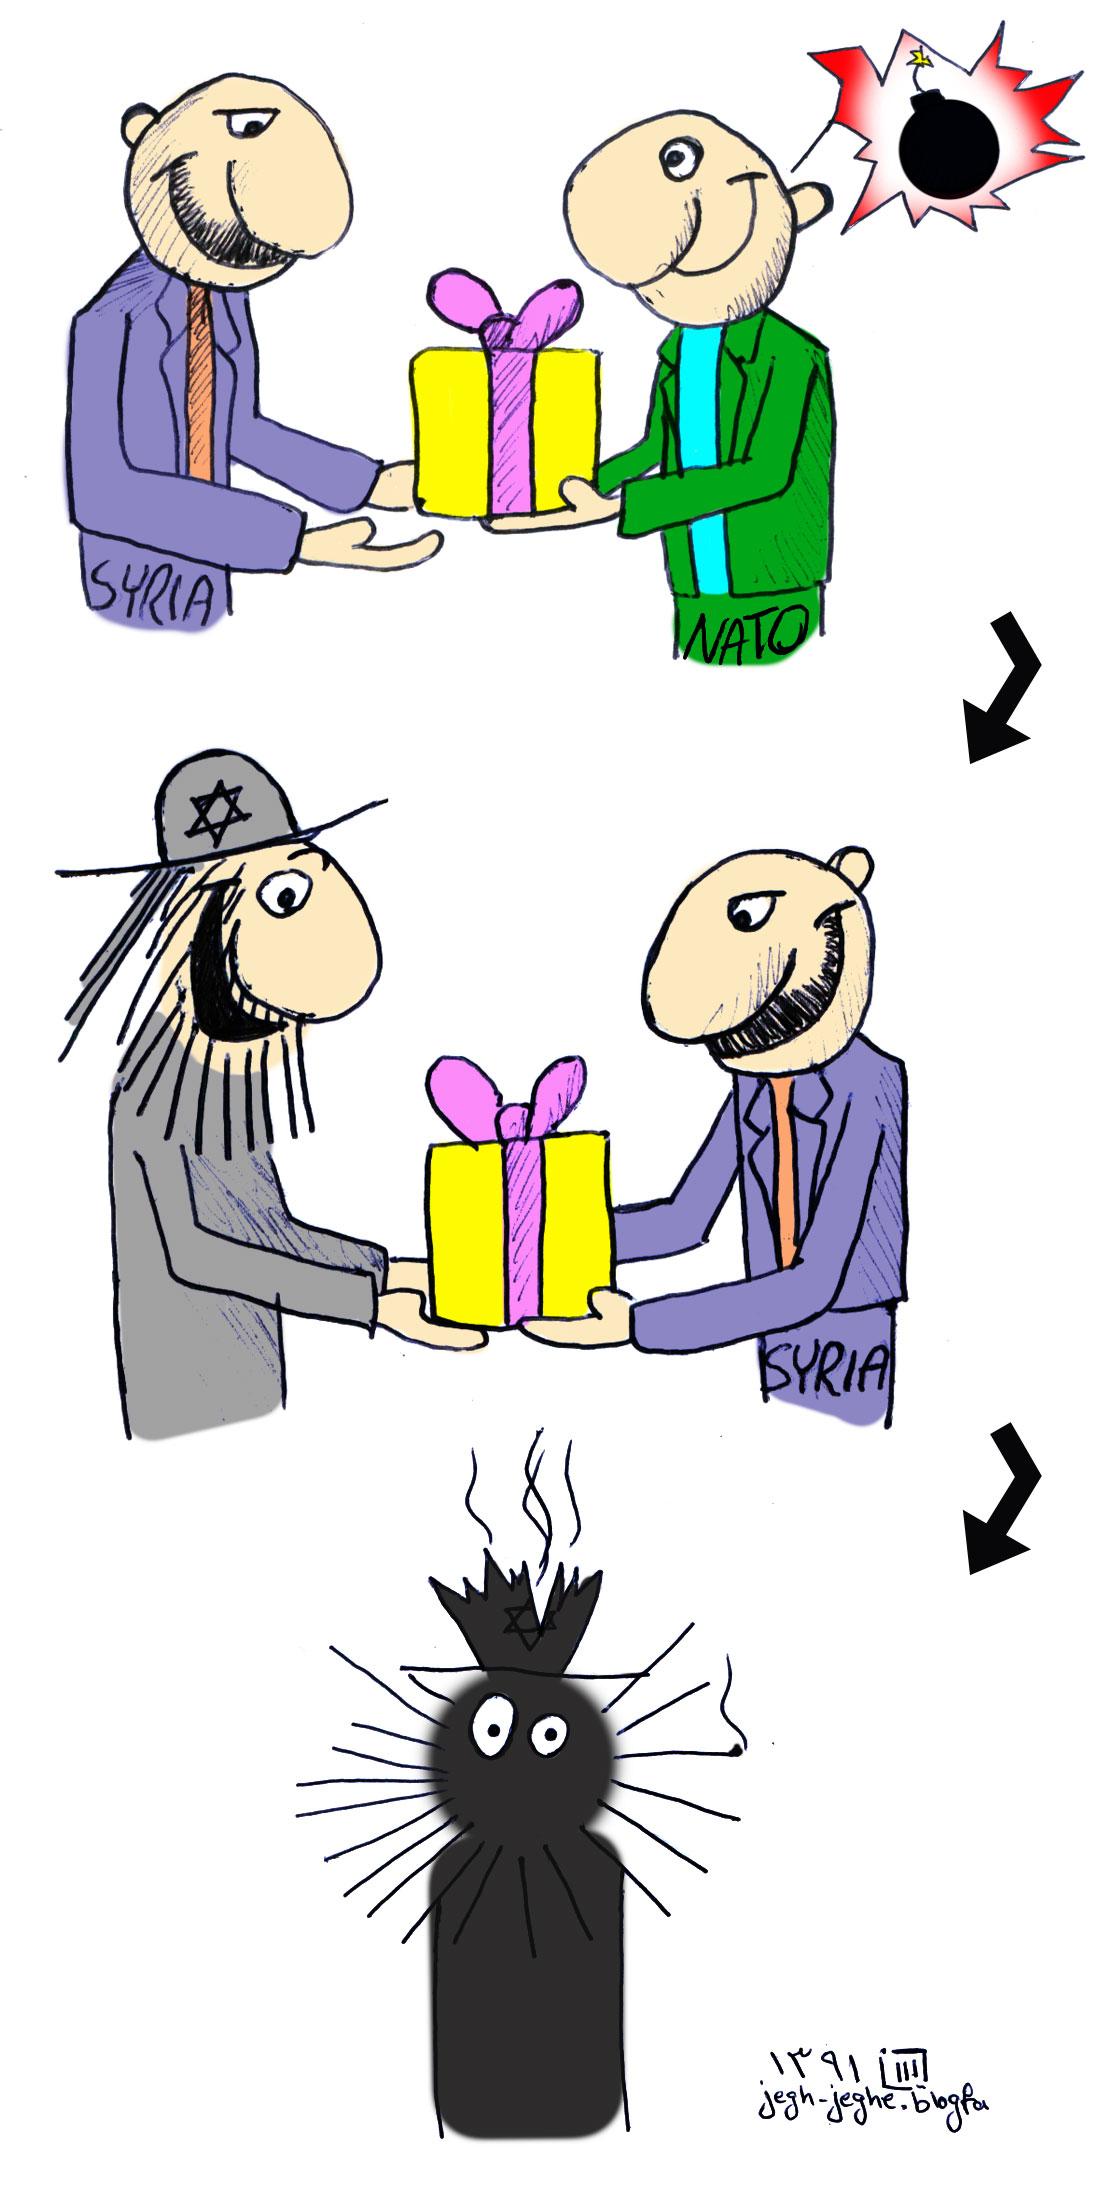 کاریکاتور - استراتژی شمشیر داموکلس